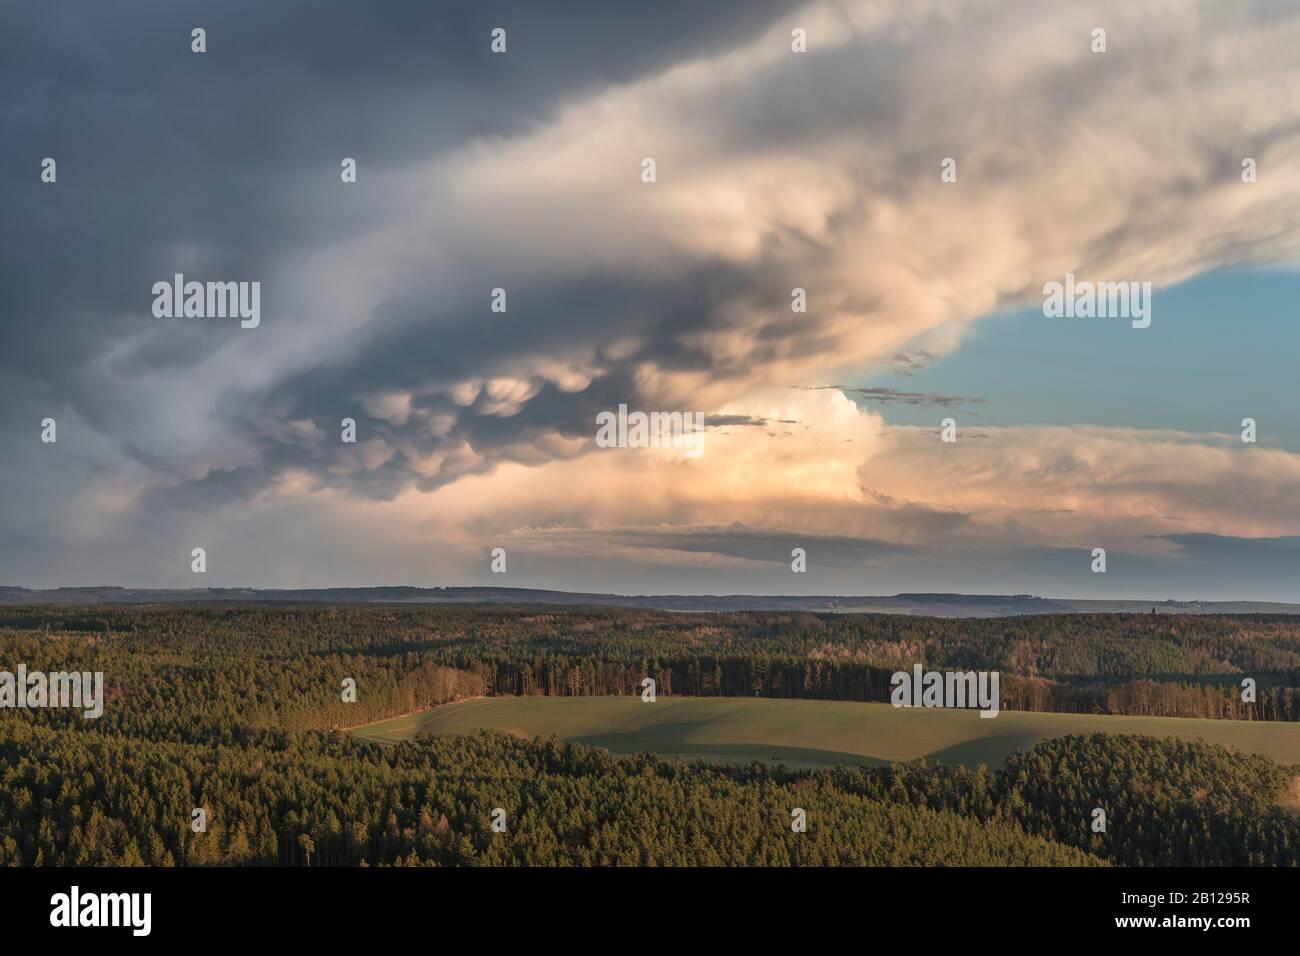 Leuchtenburg,Thunderstorm,Mammatus clouds,Sunset,Thuringe,Allemagne Banque D'Images